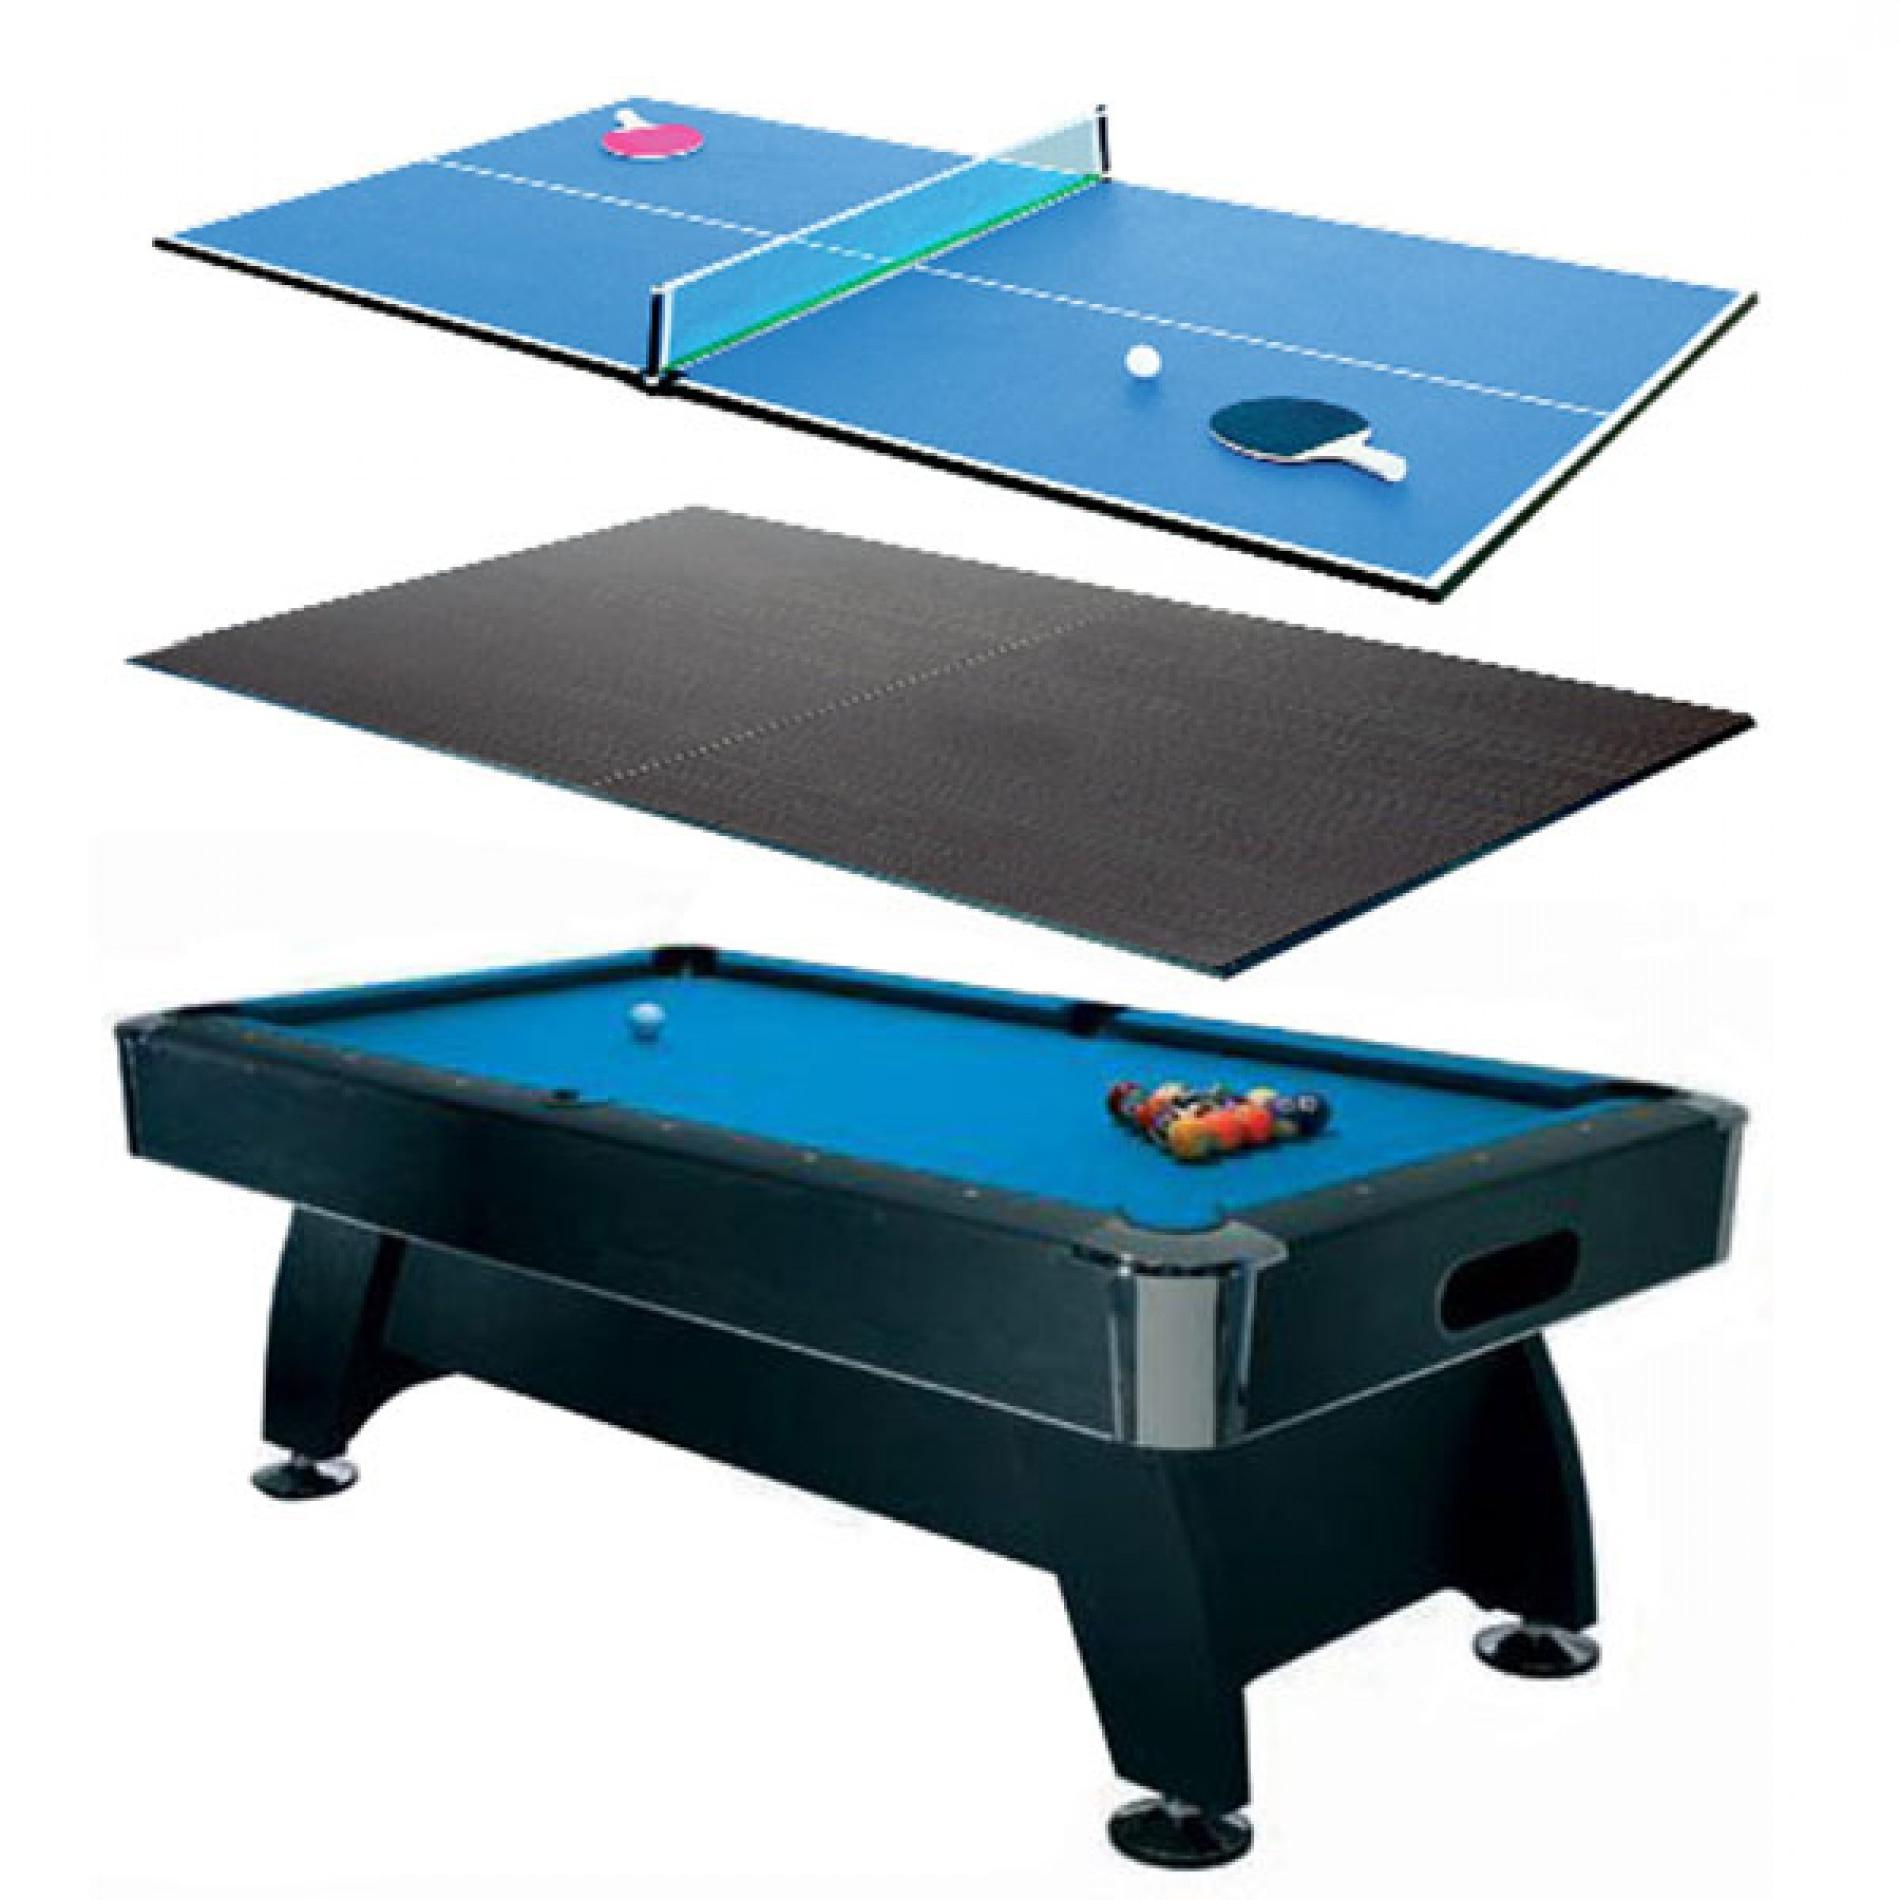 Mesas De Billar Baratas 87dx Mesa Billar Deluxe 3 En 1 Ping Pong Plus